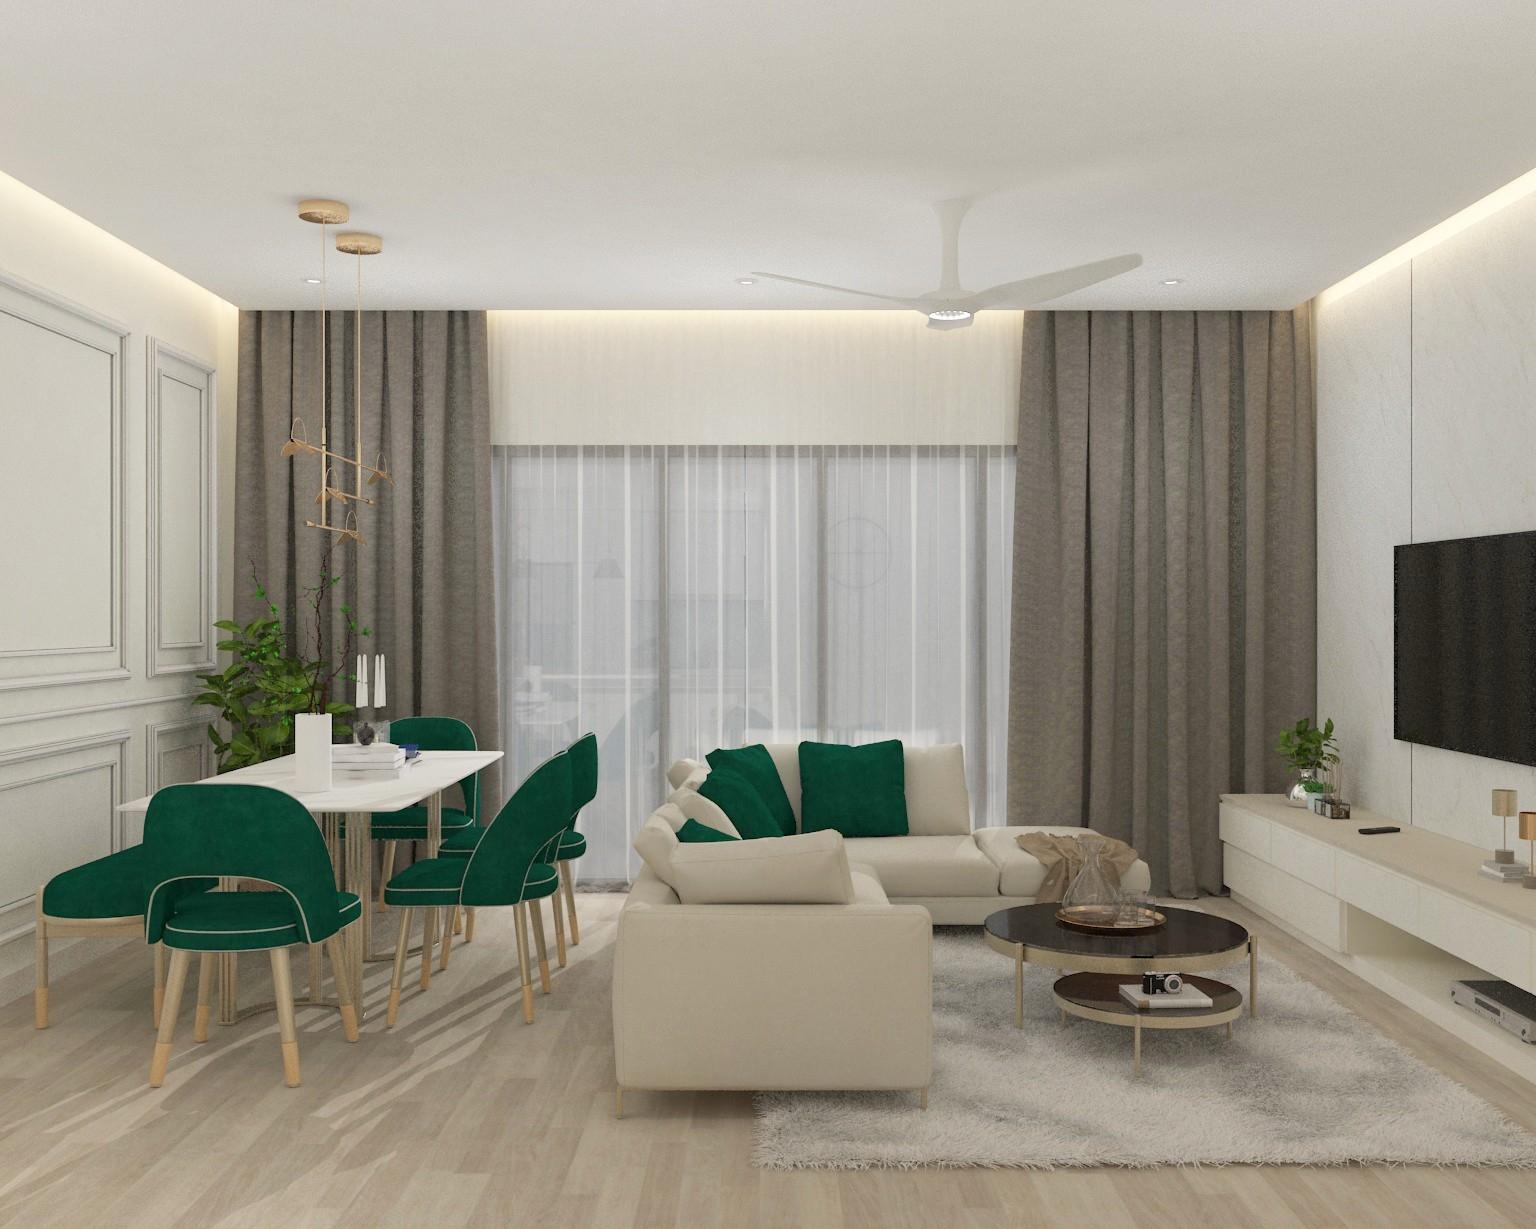 01. Living Area